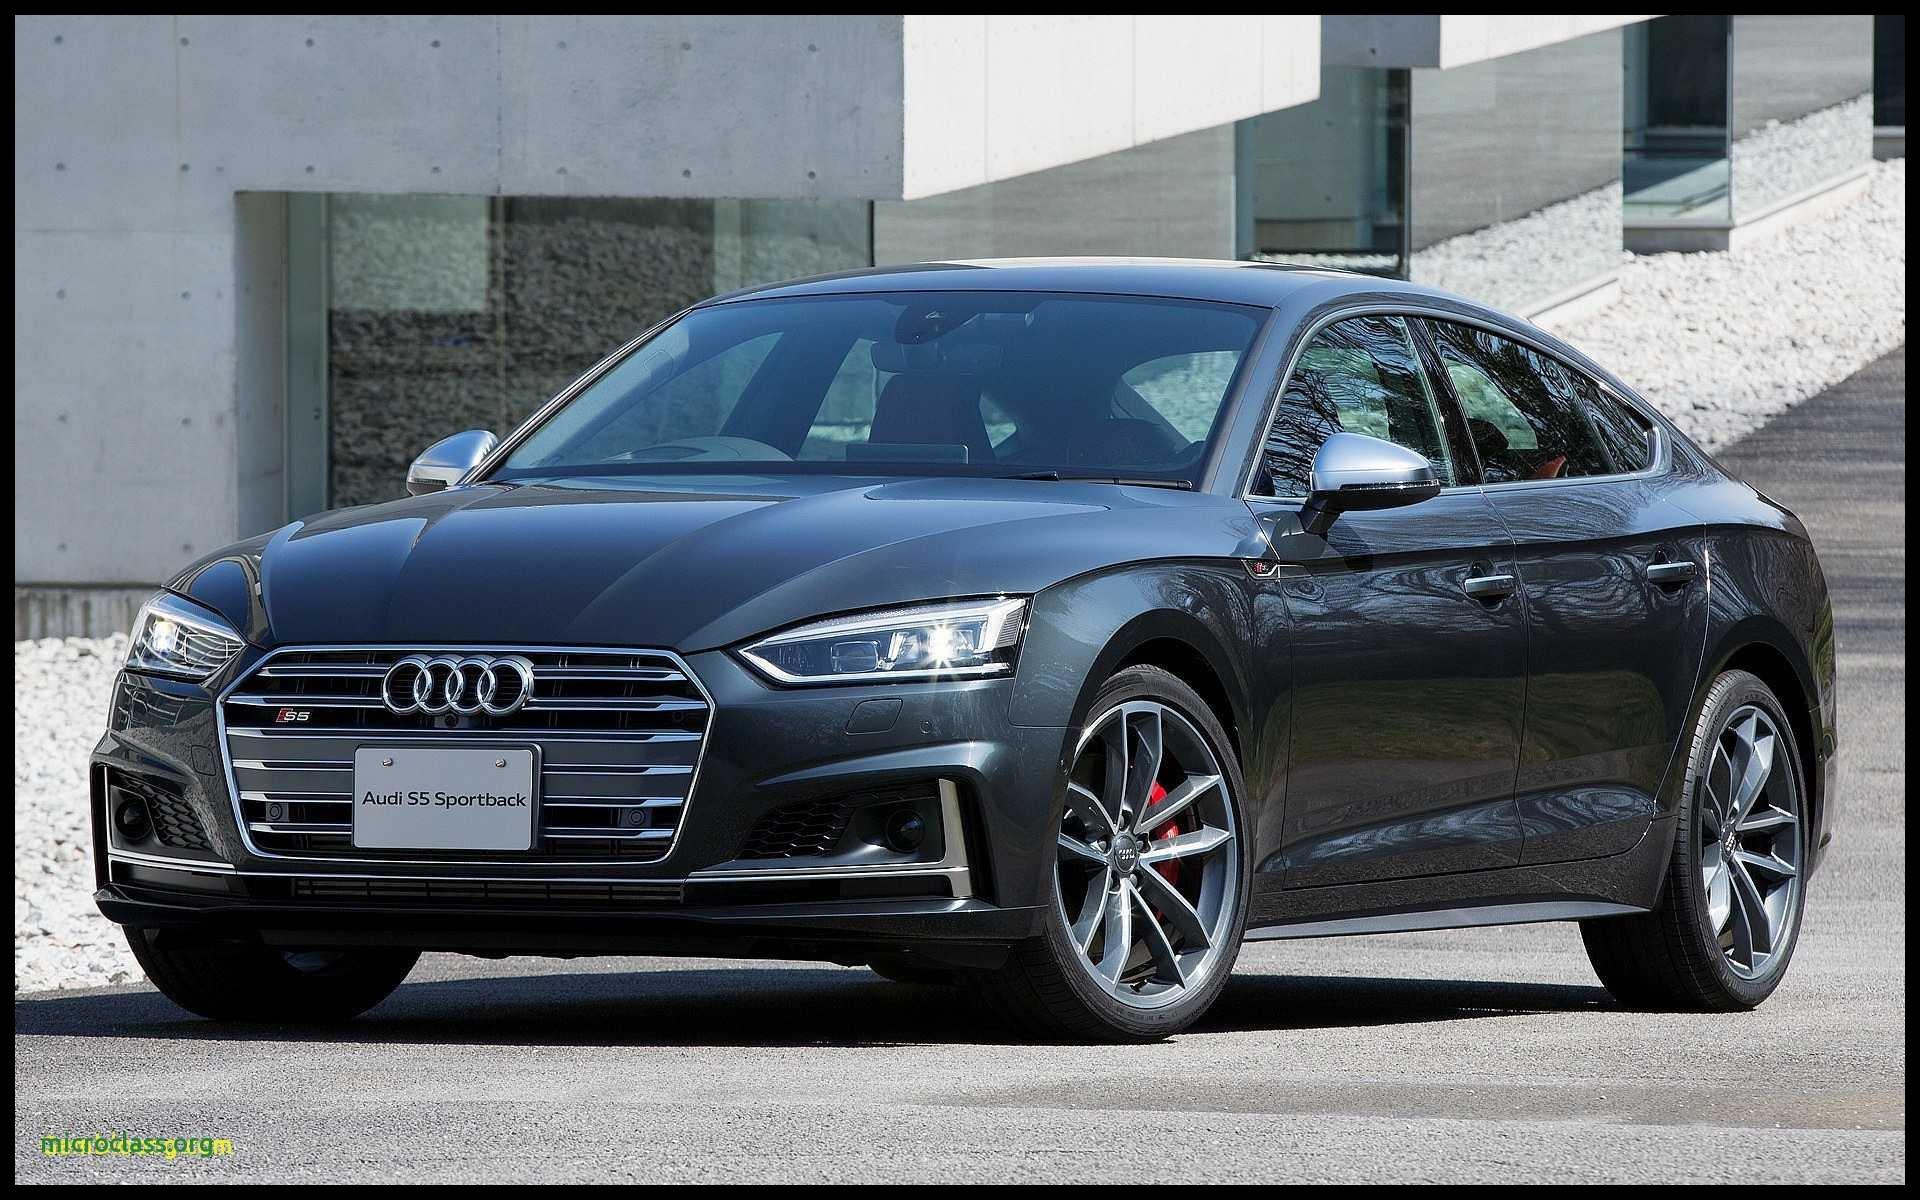 Vehicles 2019 2019 Audi A1 Cars 2018 Audi Tt Neuer Jaguar Xf 2 0d Mit Best